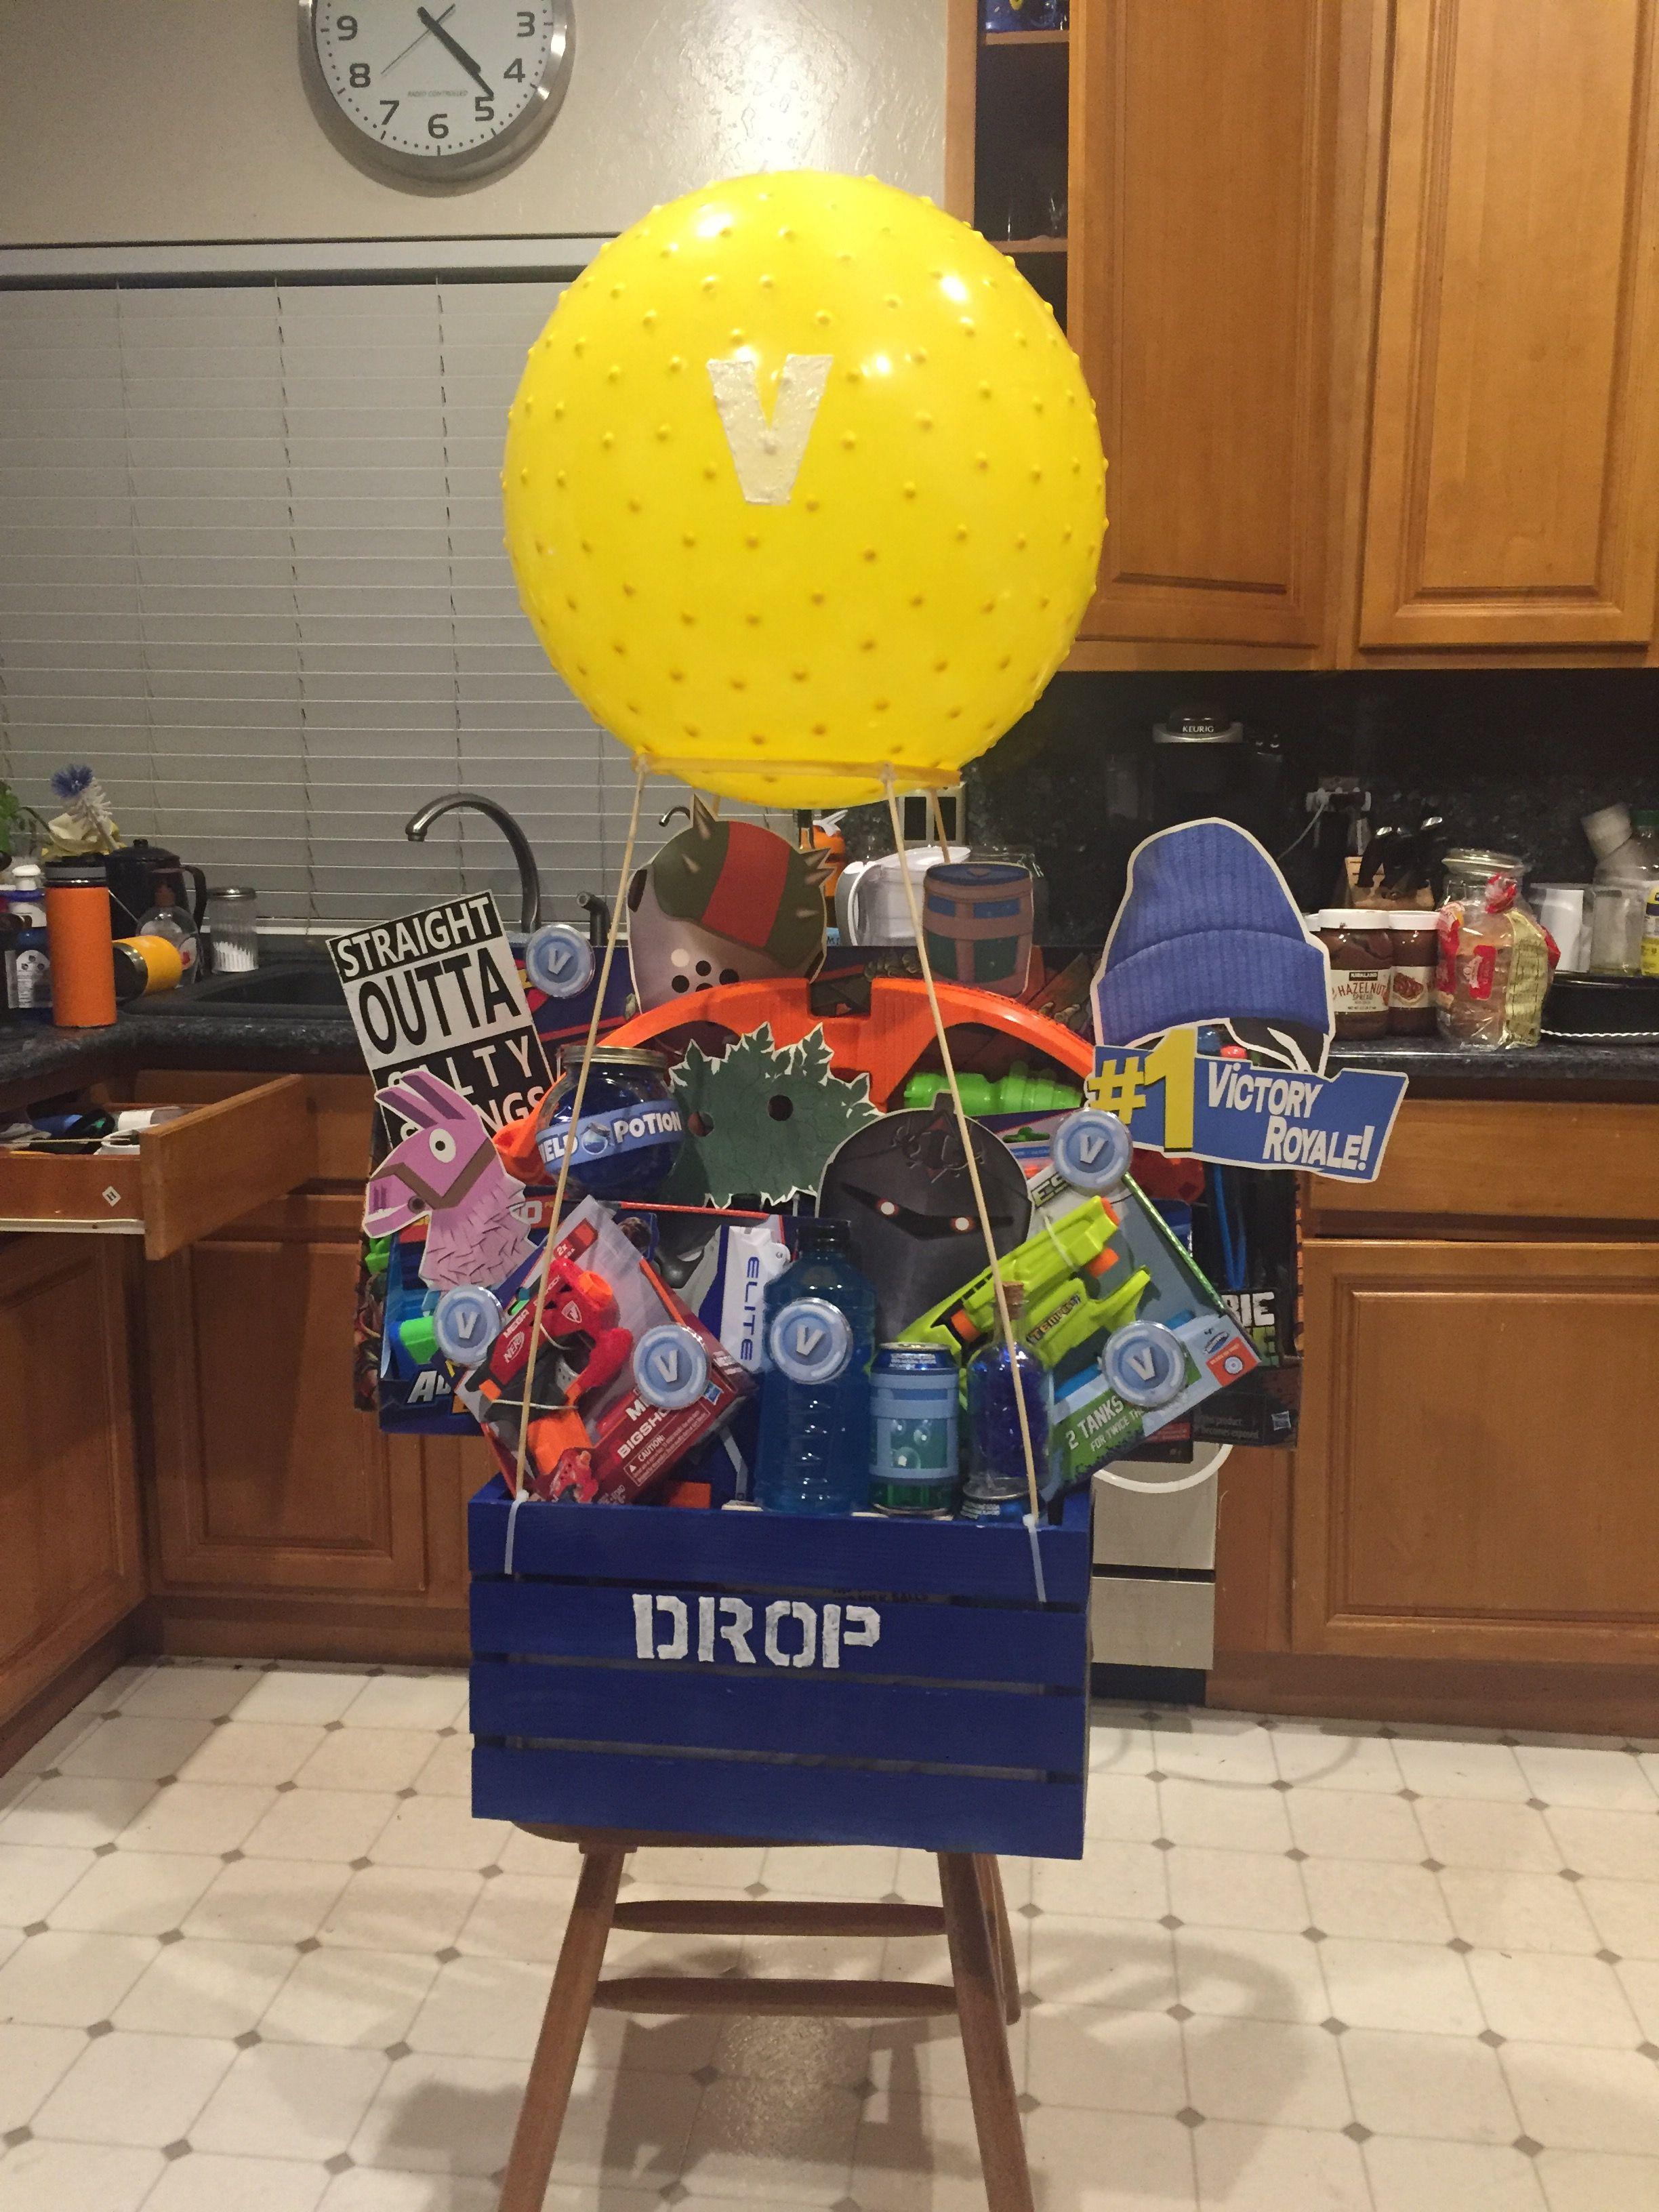 Fortnite Loot Drop Raffle Basket